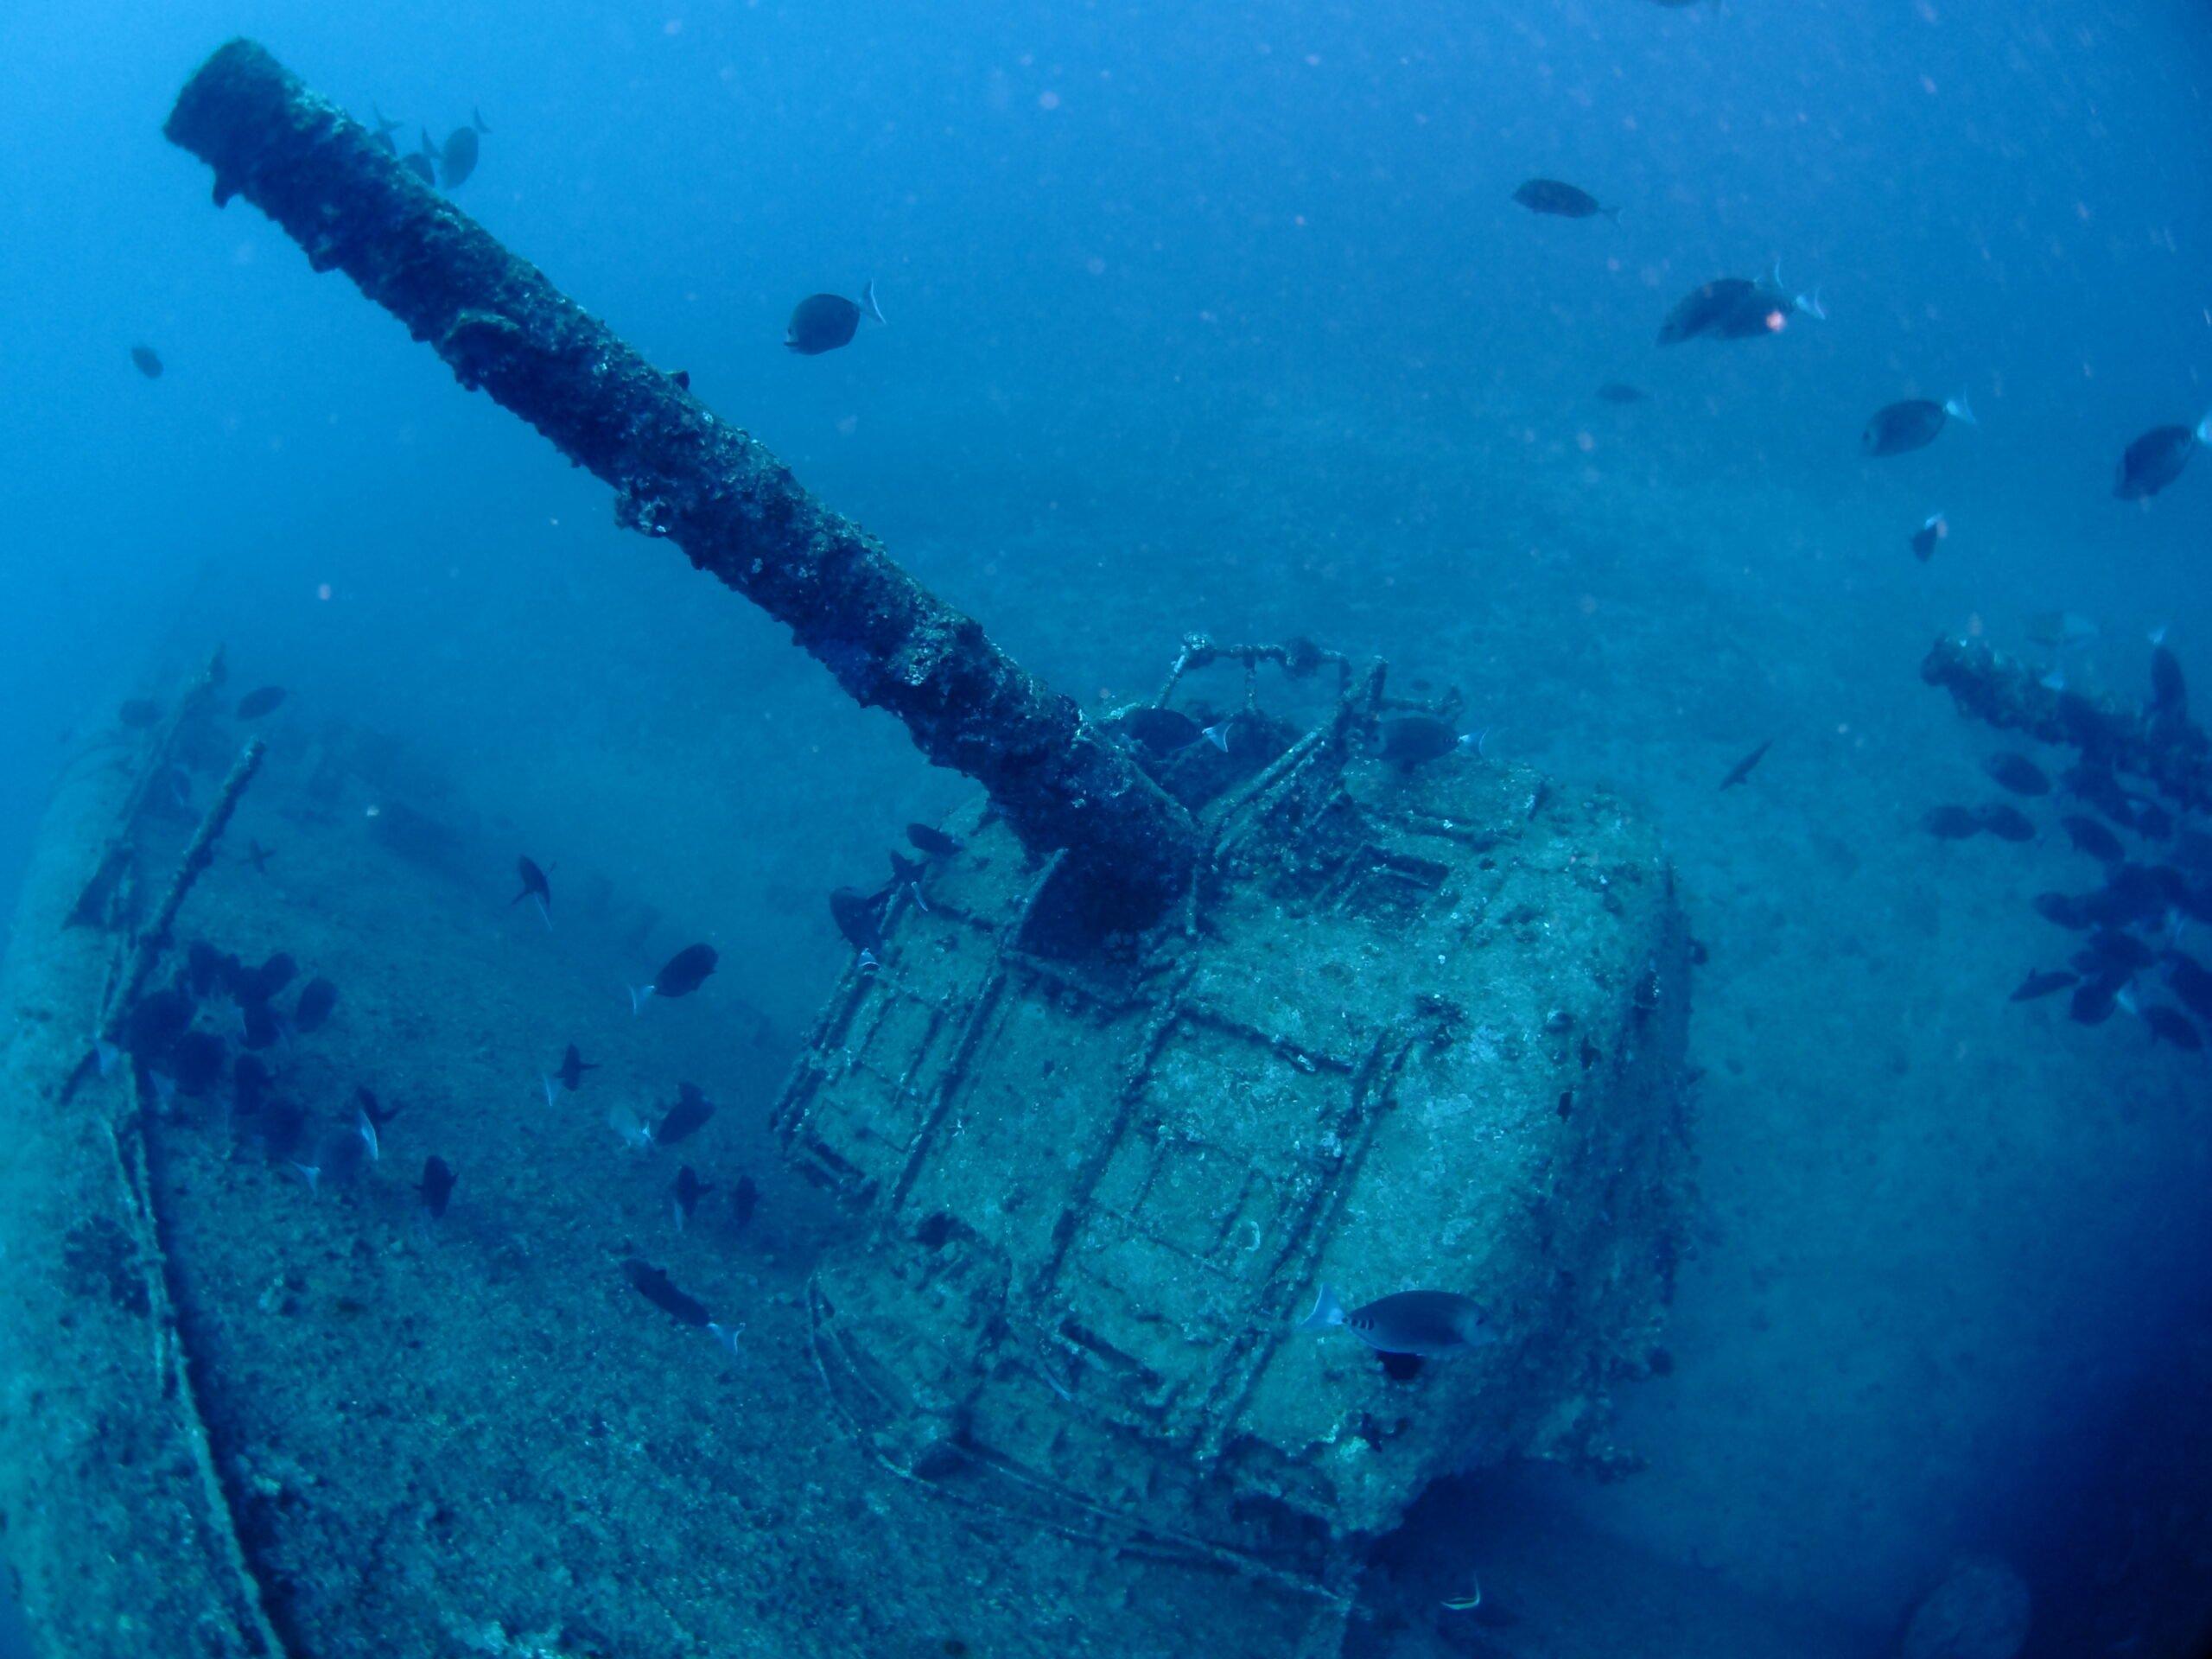 Emmons Scuba Diving